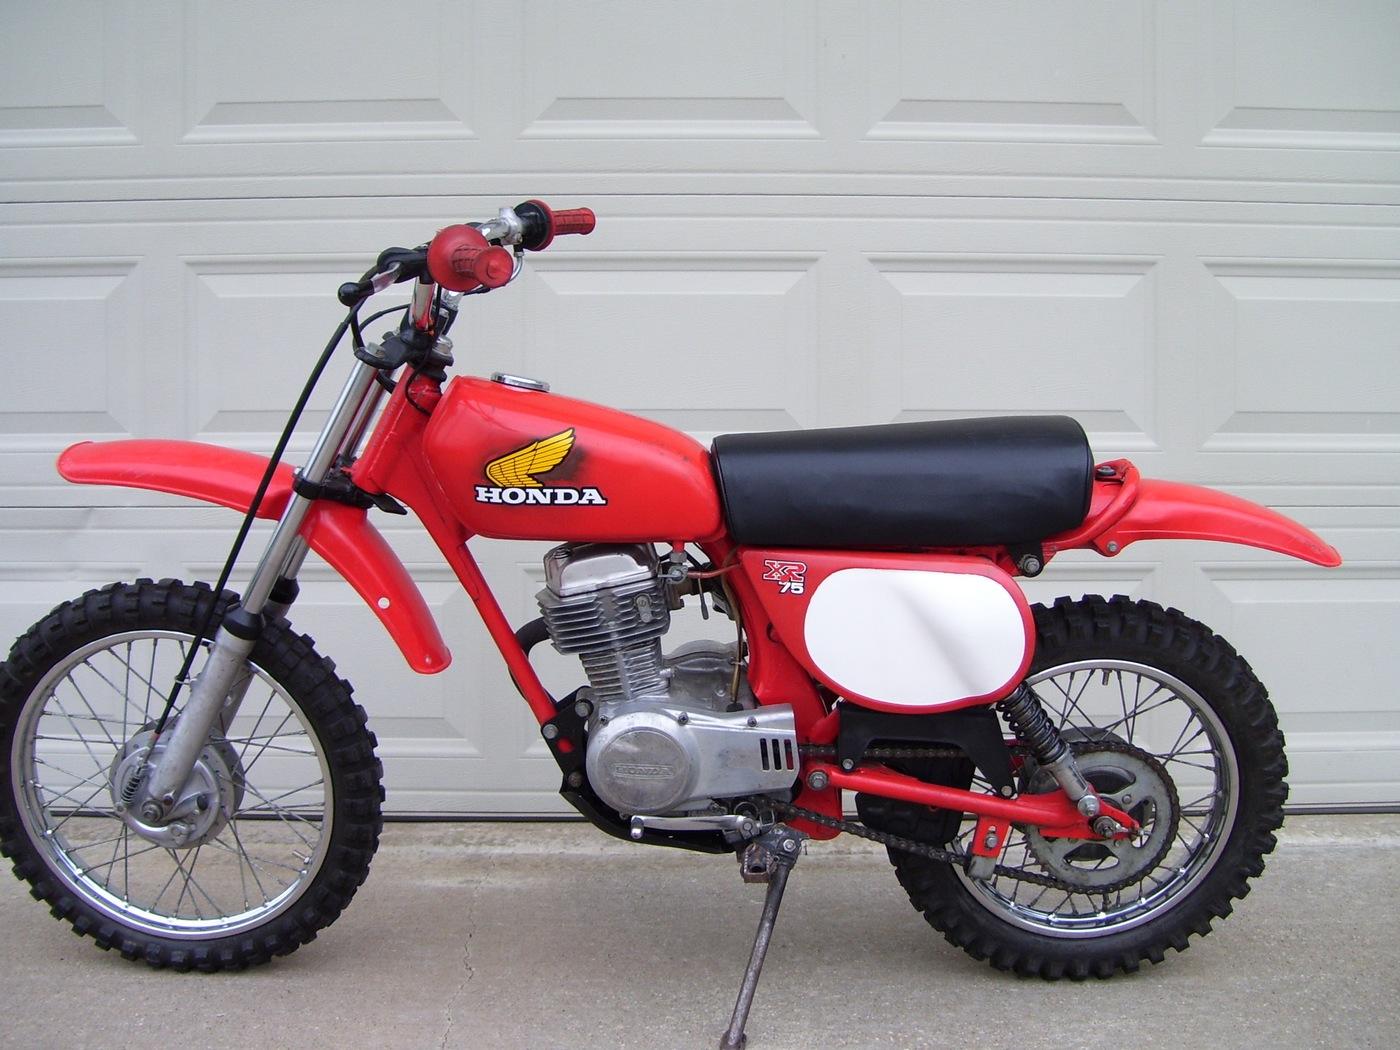 Honda Xr75 Classic Motorbikes